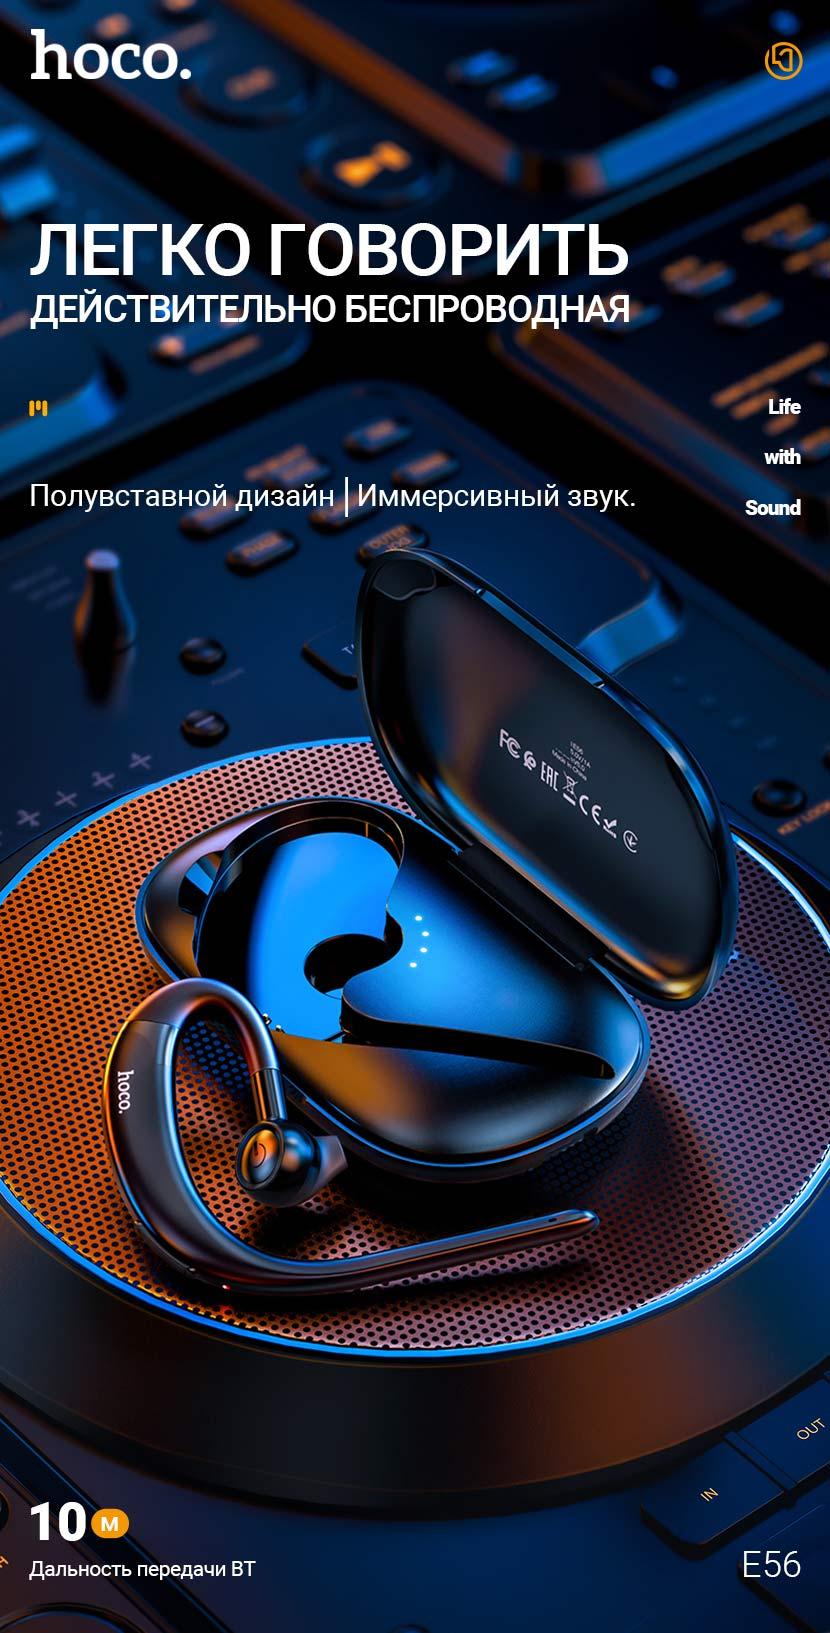 hoco news e56 shine business wireless headset ru